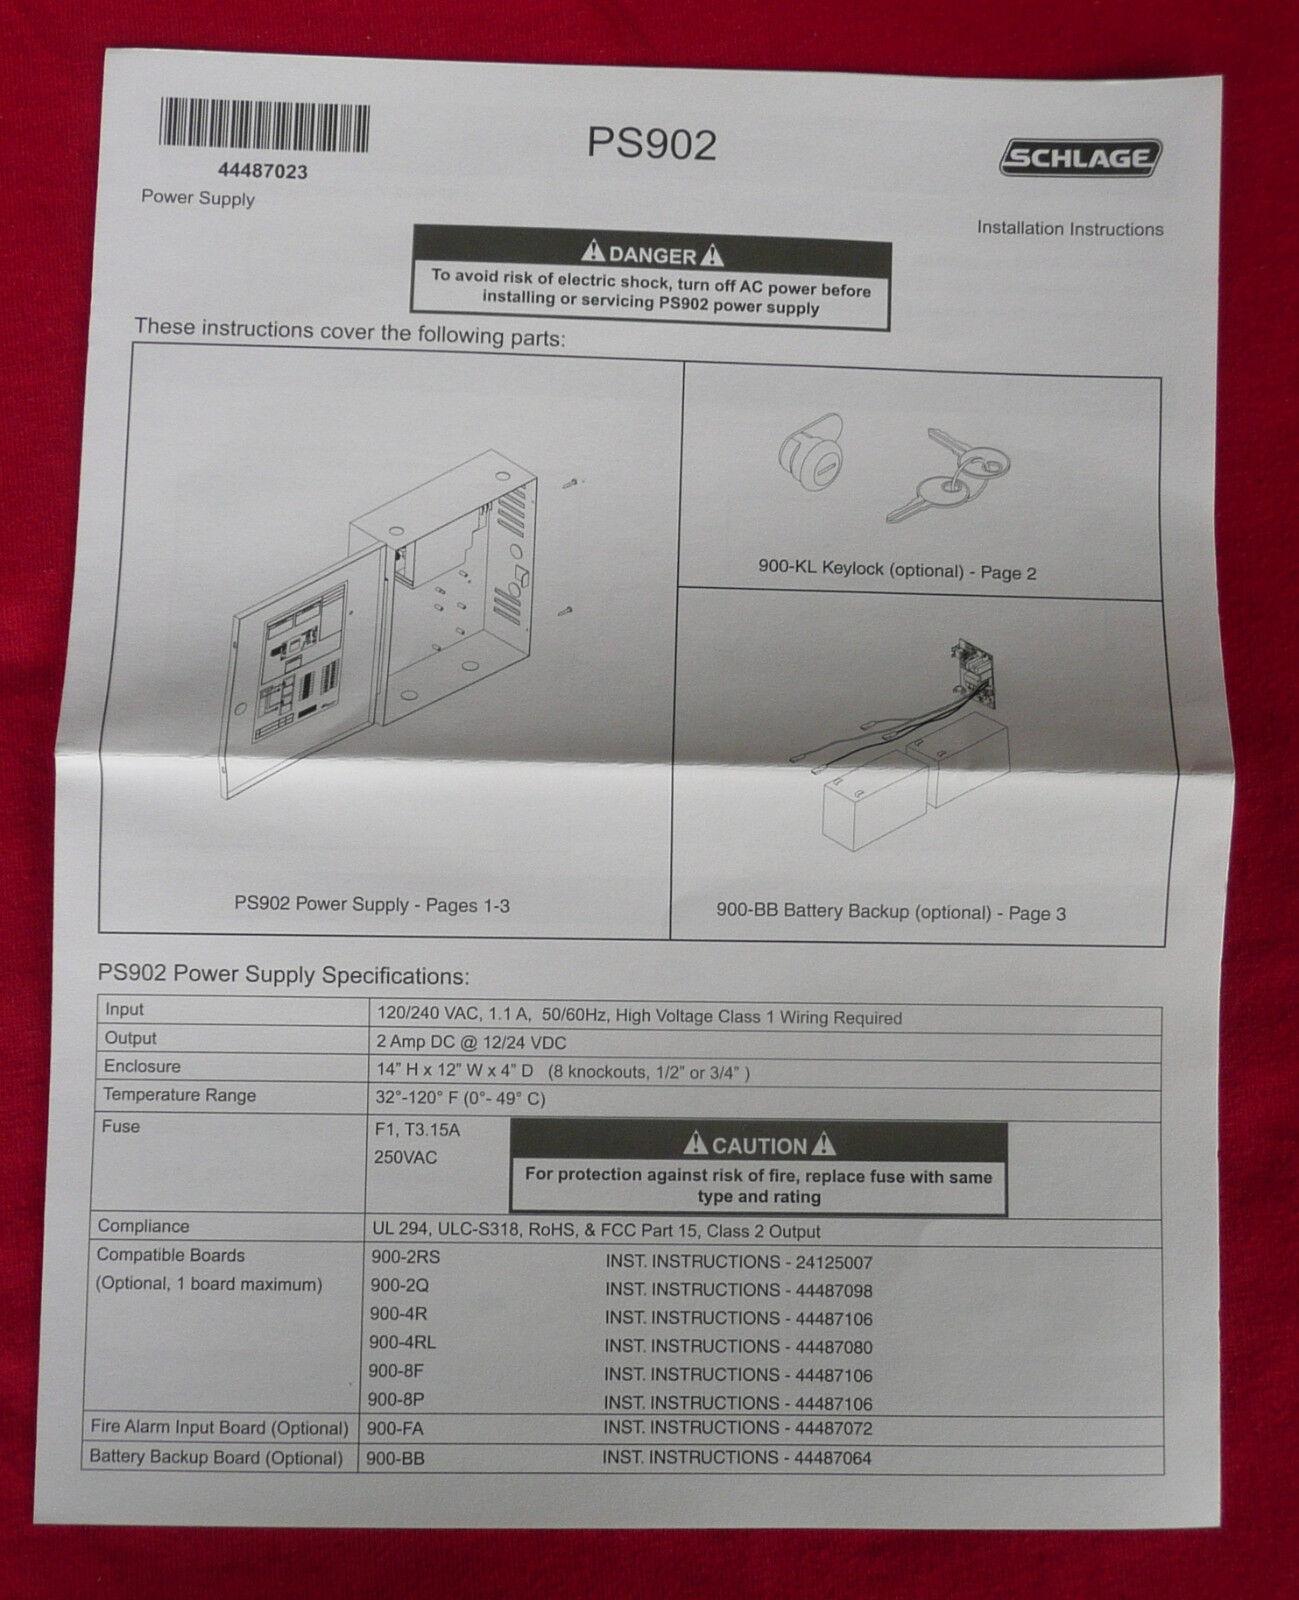 Schlage Allegion Ps902 Power Supply 2a 4448947 Ebay Fa 900 Wiring Diagram